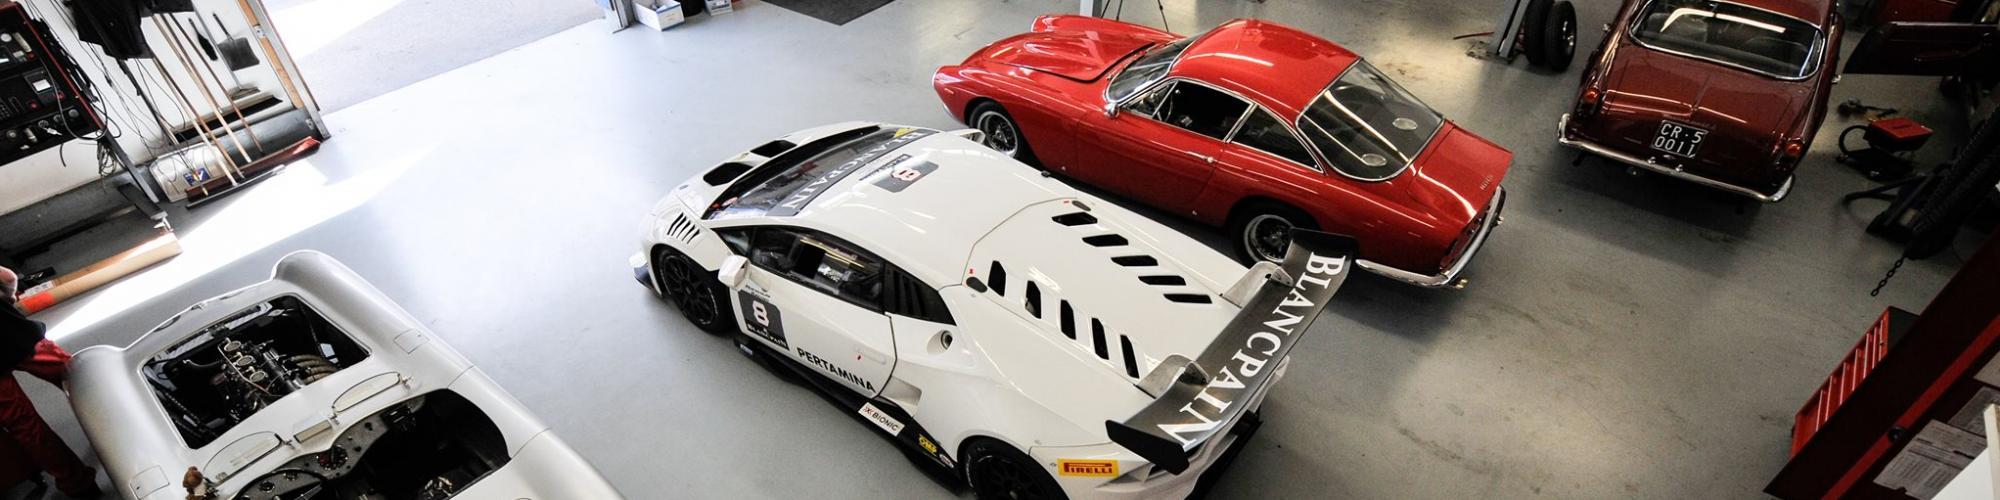 Tom Fischer Classic & Race Car Service